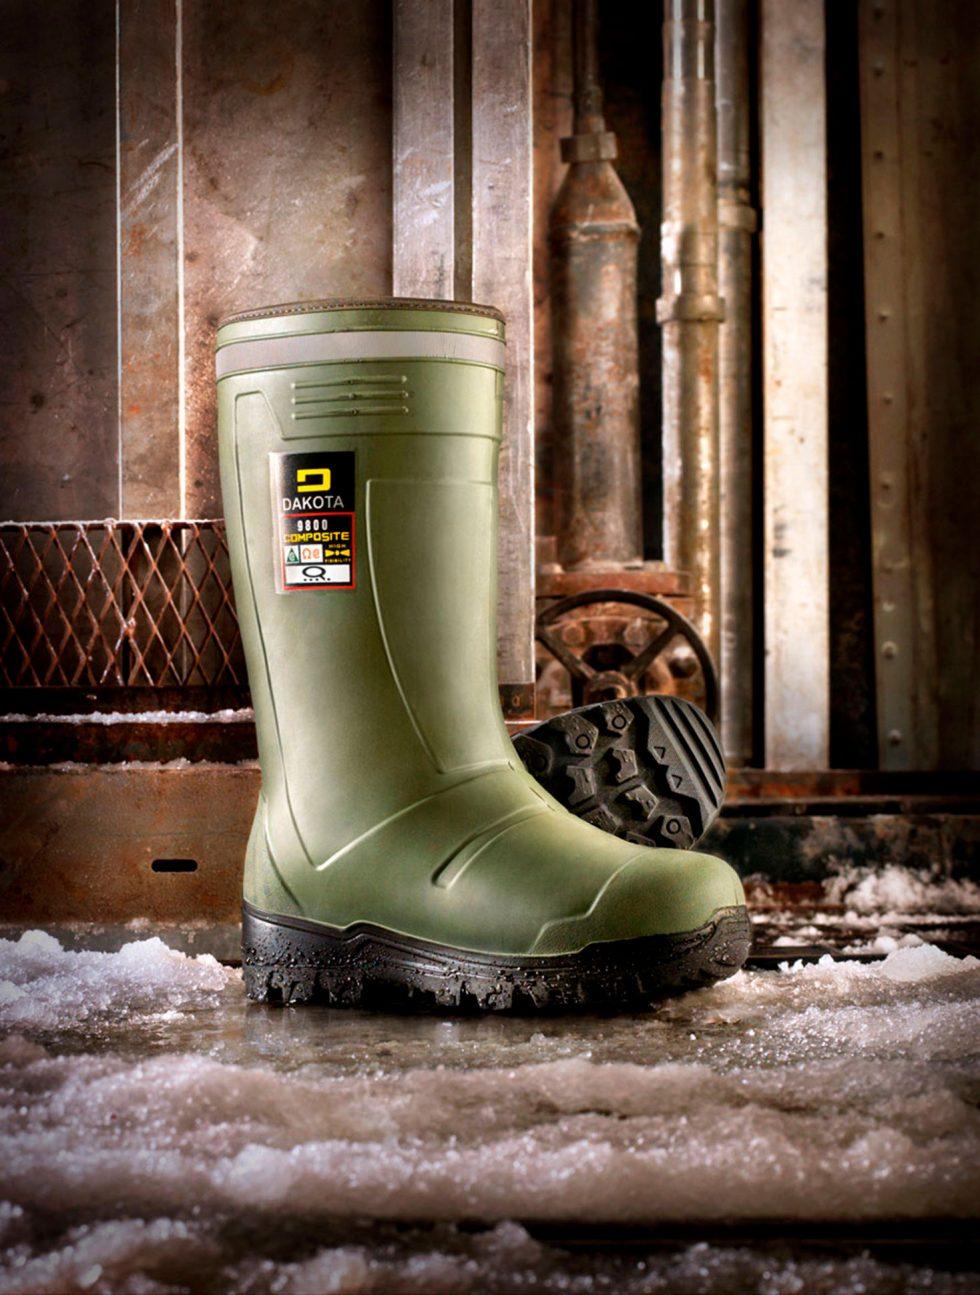 Calgary product Photographer. Dakota rubber boot in factory setting.